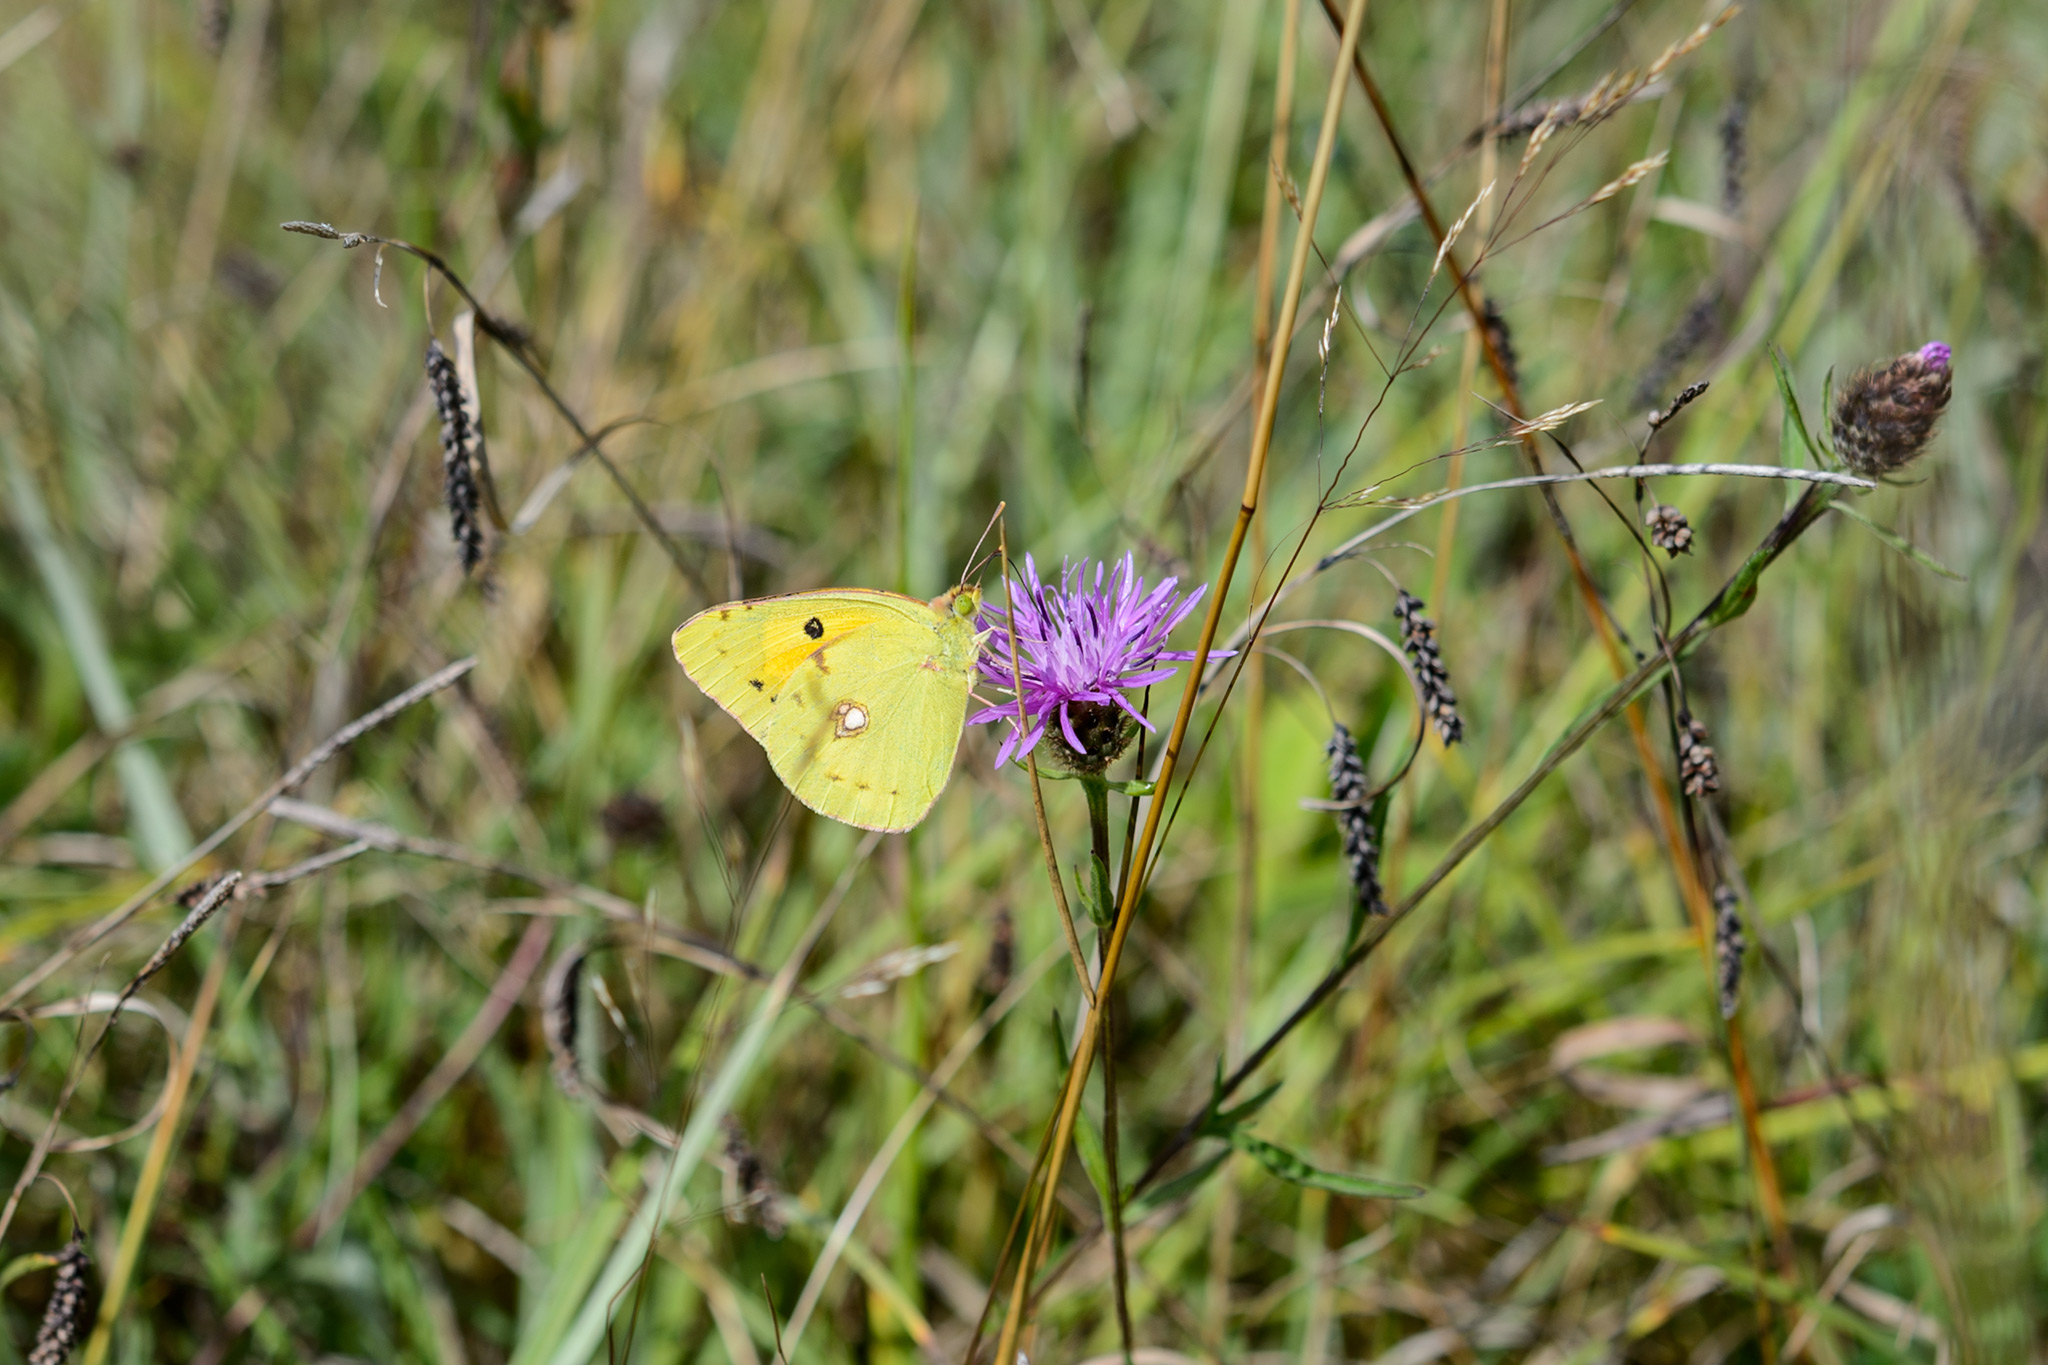 yellow-brimstone-butterfly-on-knapweed-centaurea-nigra-flower-2